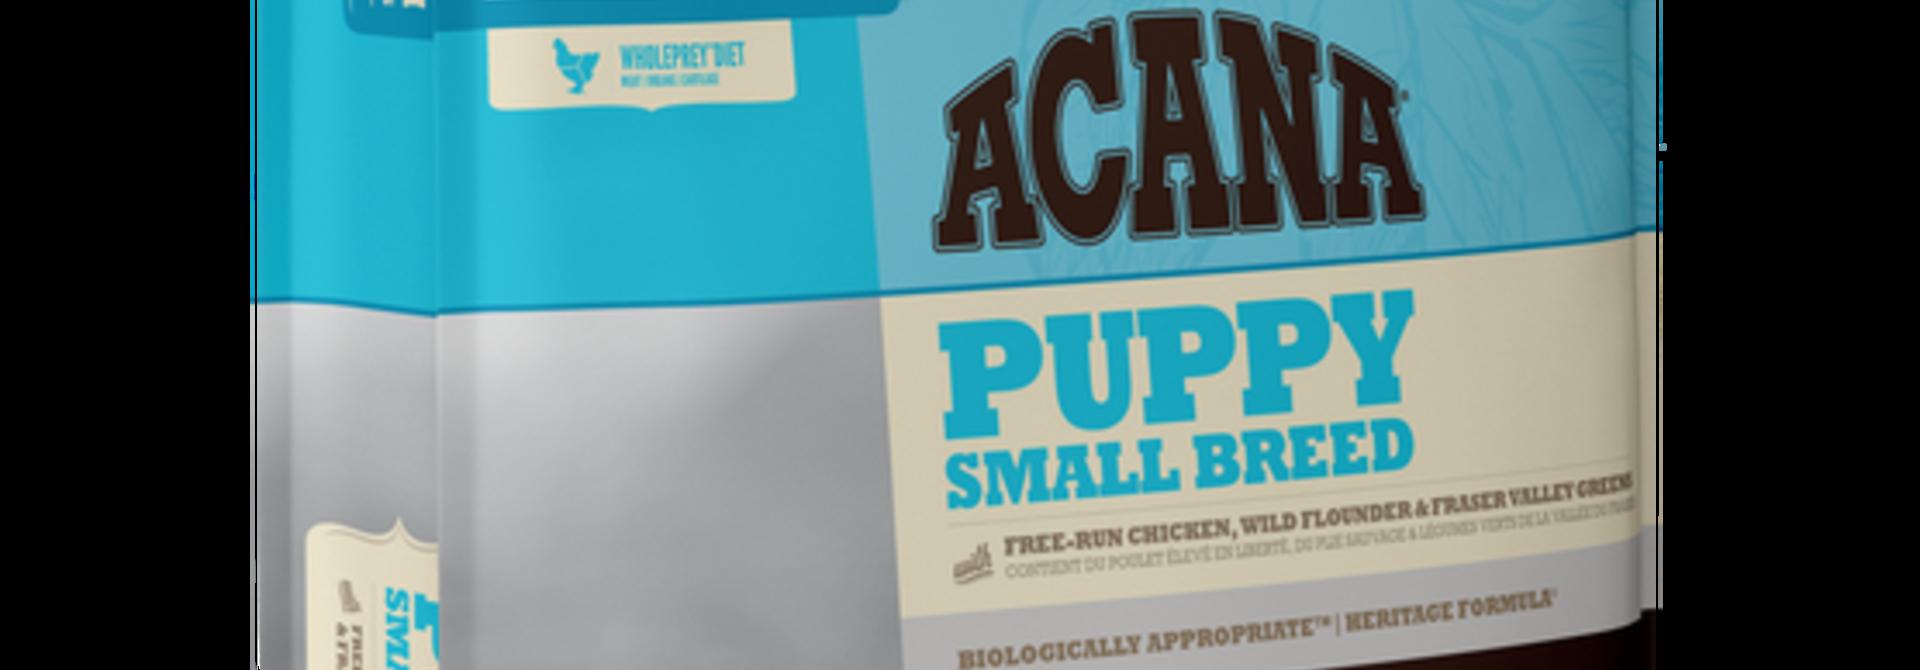 ACH Small Breed Puppy